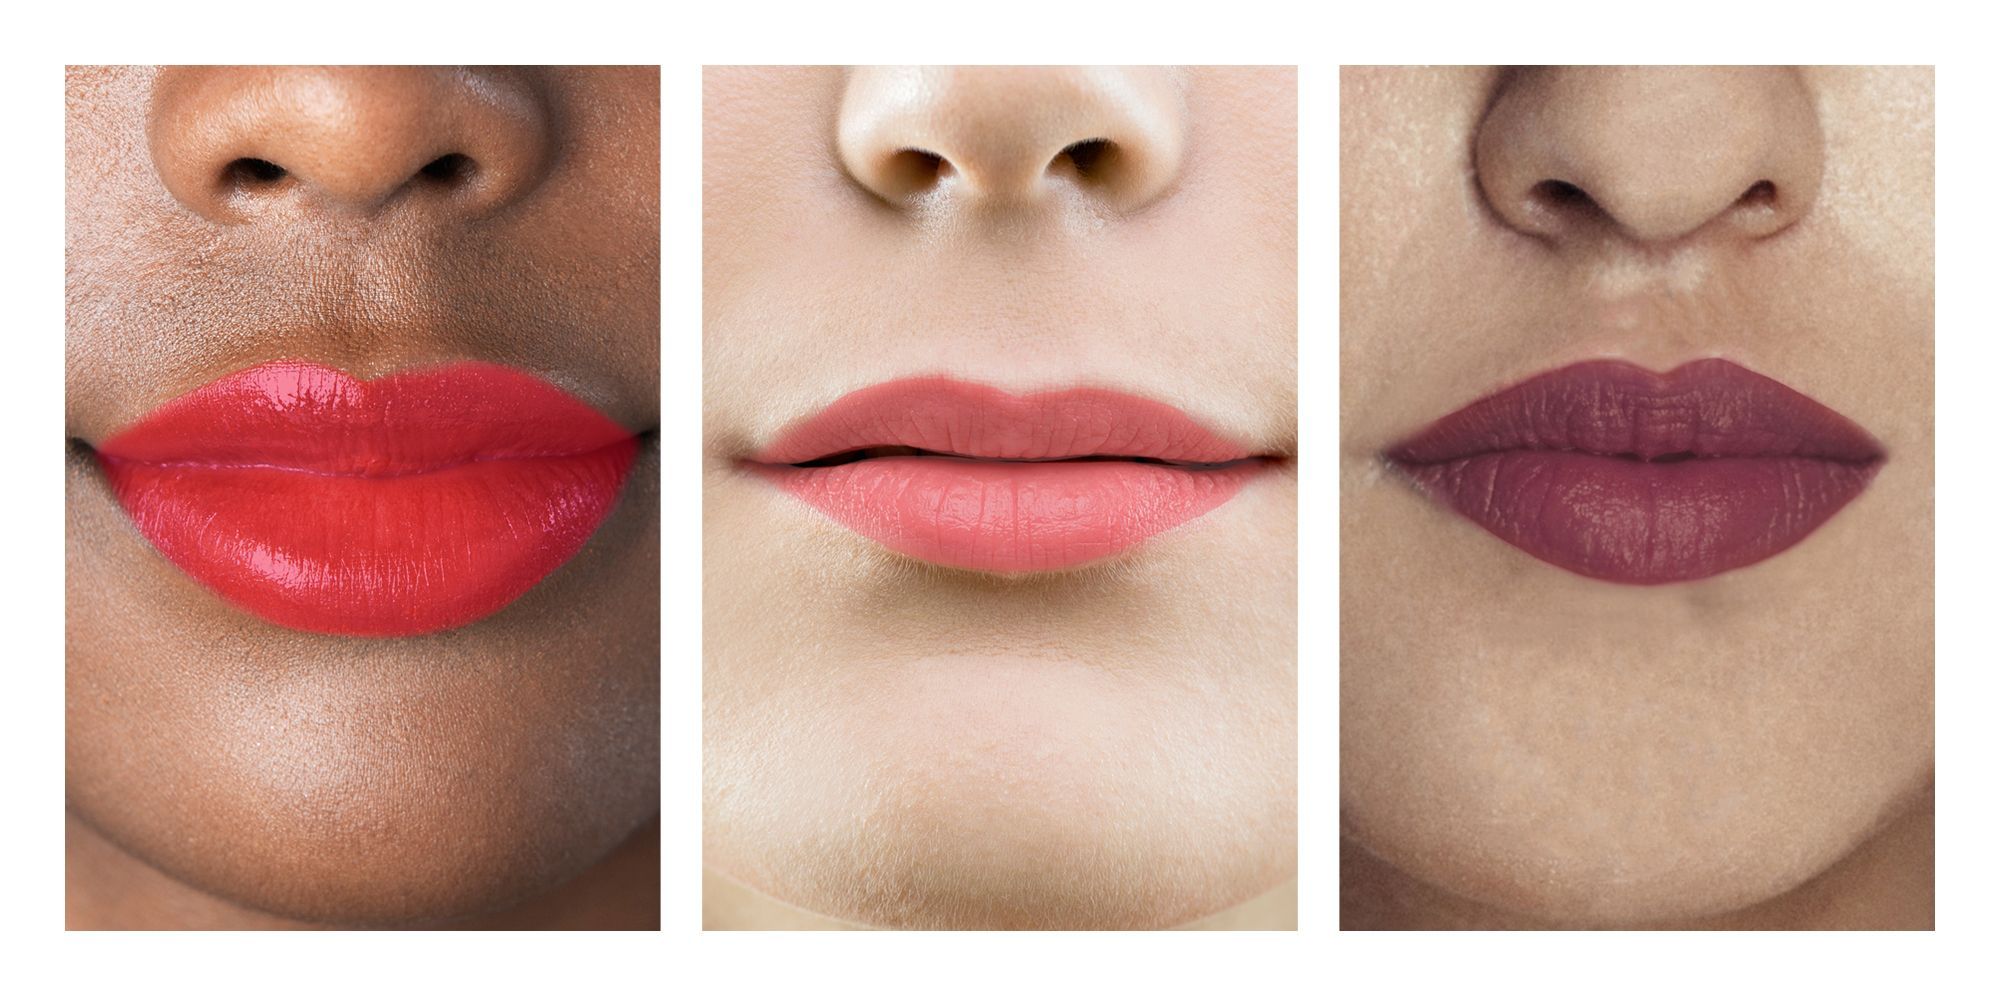 15 Best Matte Lipstick Colors Top Matte Lip Gloss Pencil And Liquid